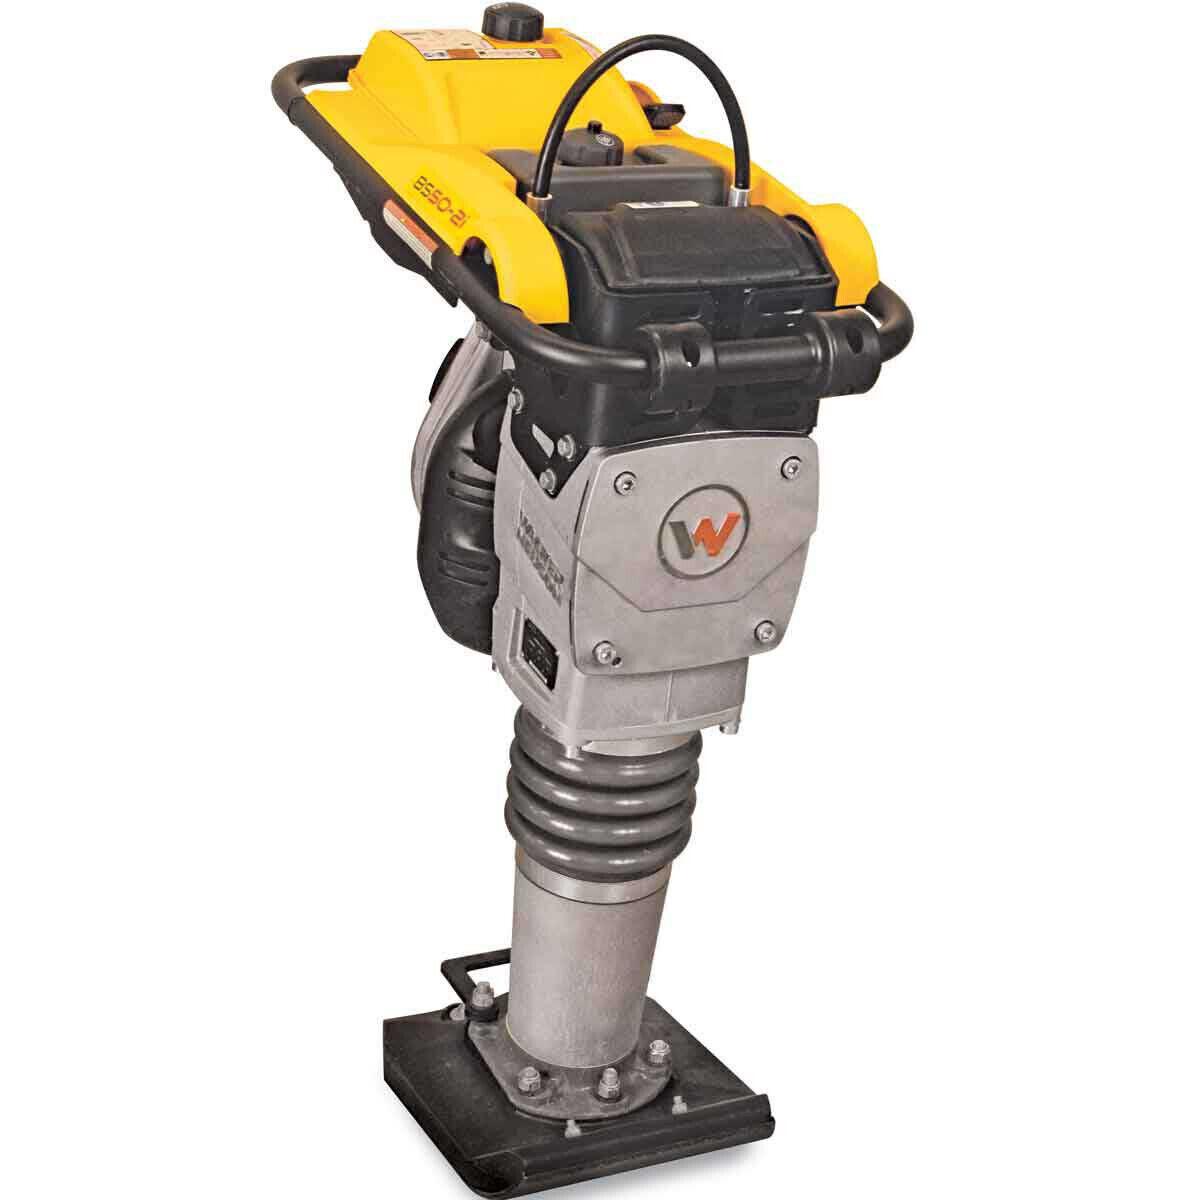 Wacker Neuson Oil-Injected BS Series Vibratory Rammer